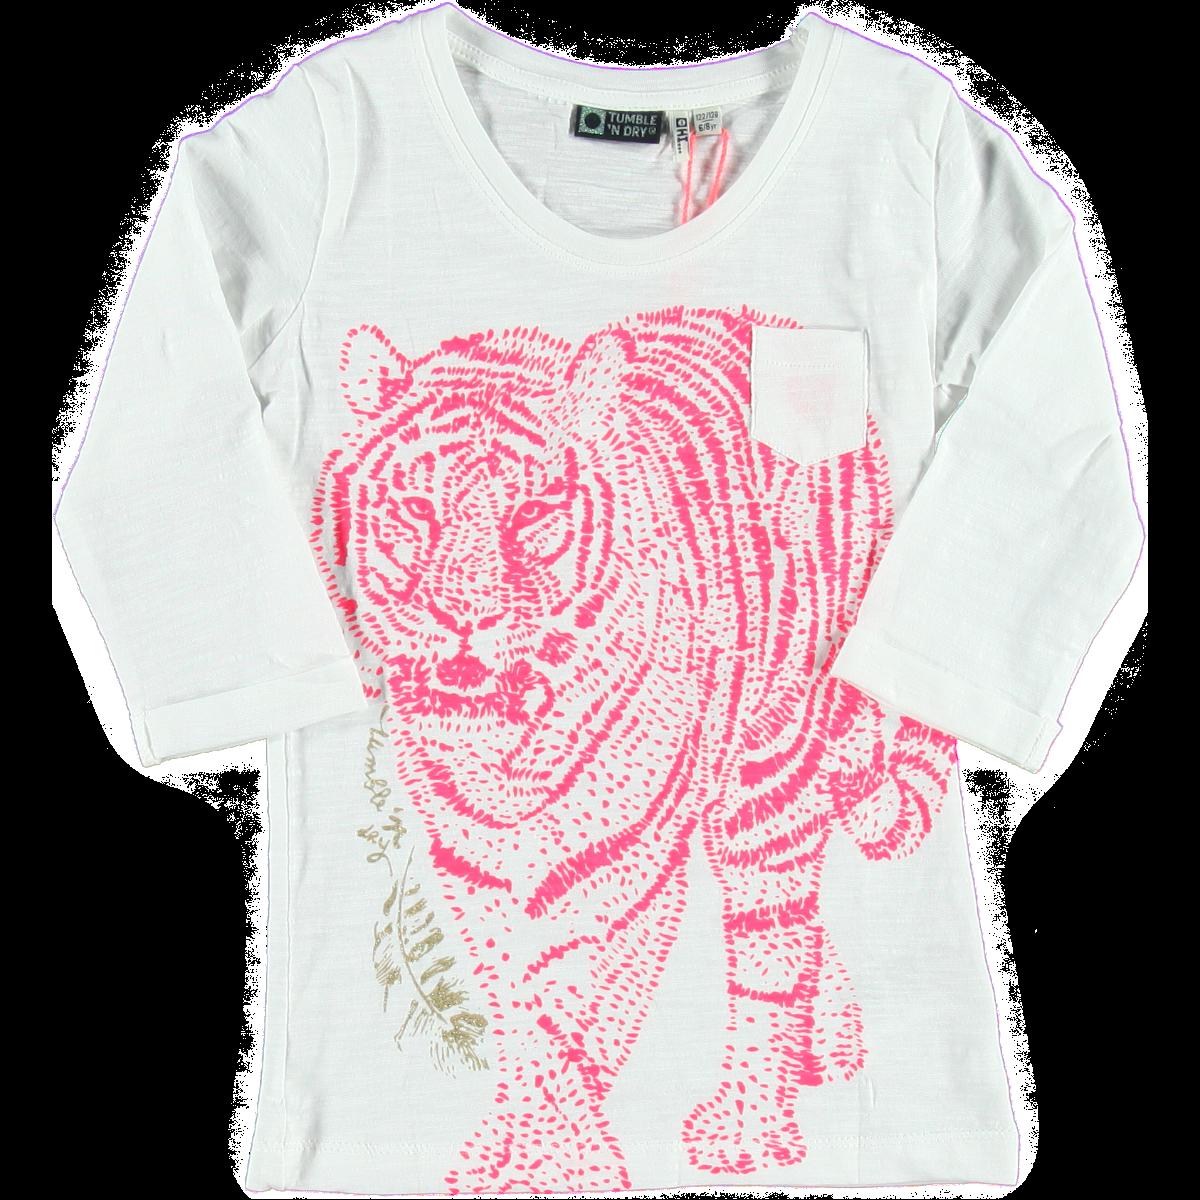 T-Shirt White | Tumble n Dry | Daan en Lotje https://daanenlotje.com/kids/meisjes/tumble-and-dry-t-shirt-white-001225